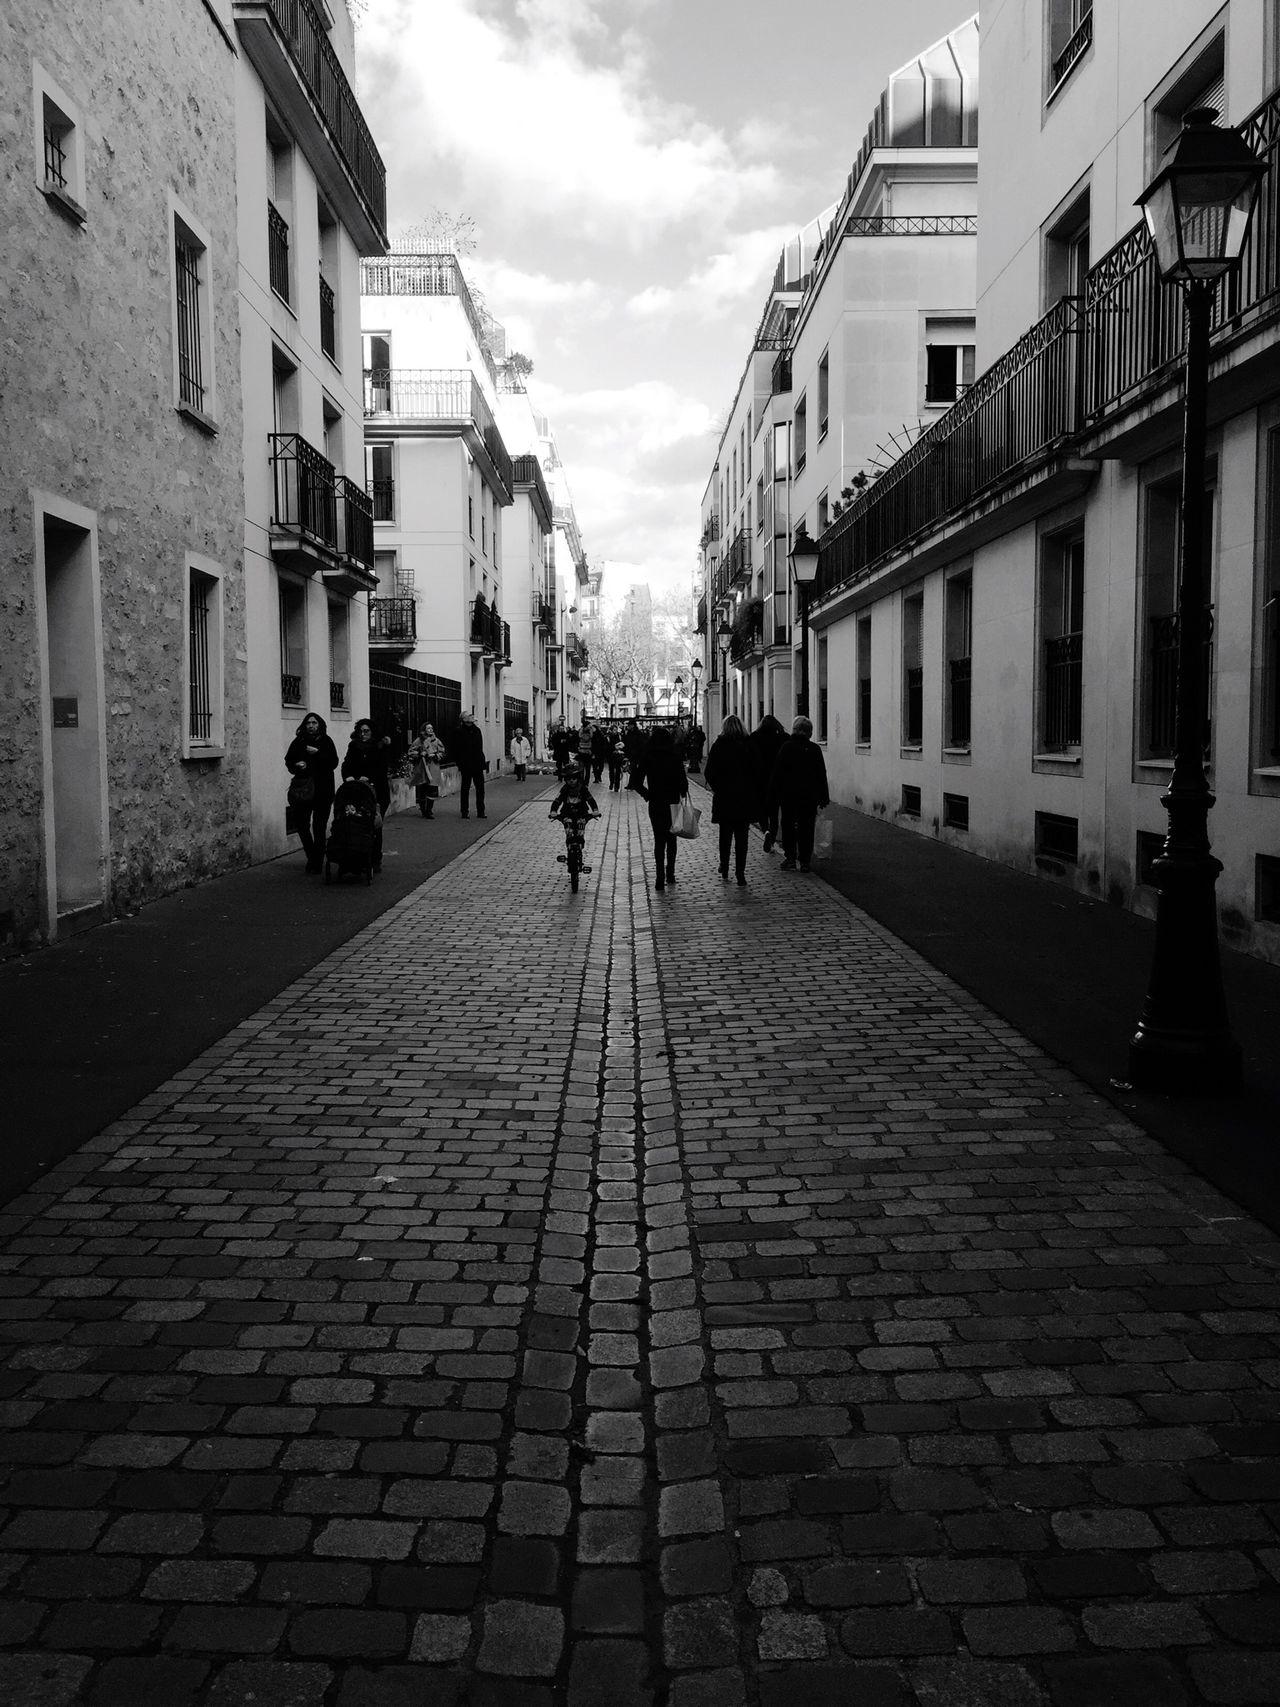 TheMinimals (less Edit Juxt Photography) EyeEm Best Shots - Black + White Streetphoto_bw Bw_collection Black & White Blackandwhite Black And White EyeEm Best Shots